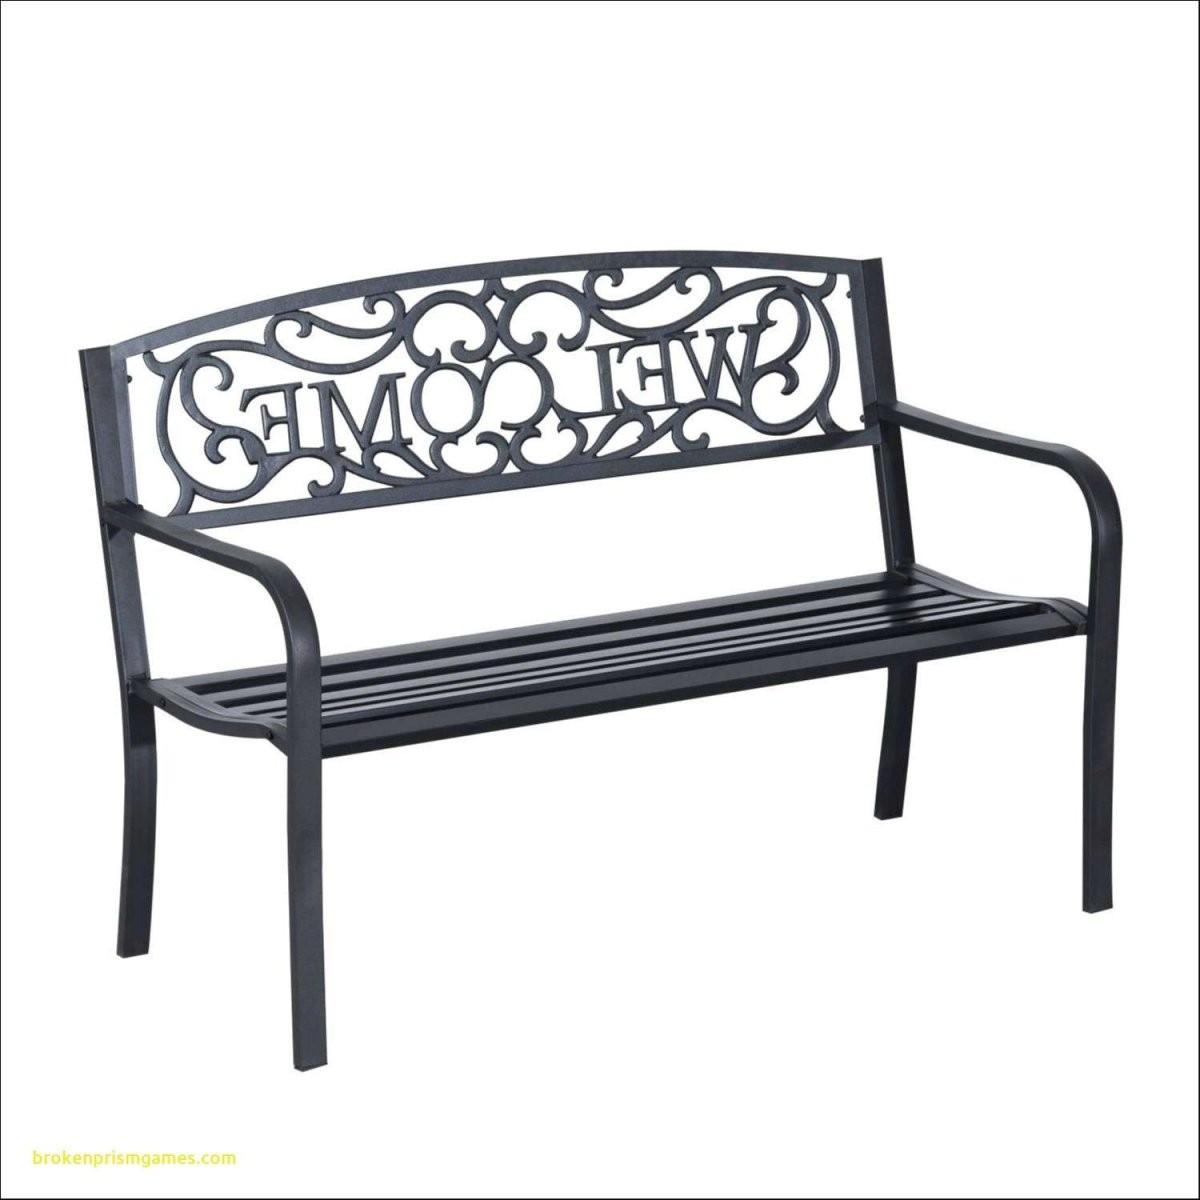 Gartenbank Metall Holz Design Von Gartenbank 3 Sitzer  Komplette von Gartenbank 3 Sitzer Metall Bild